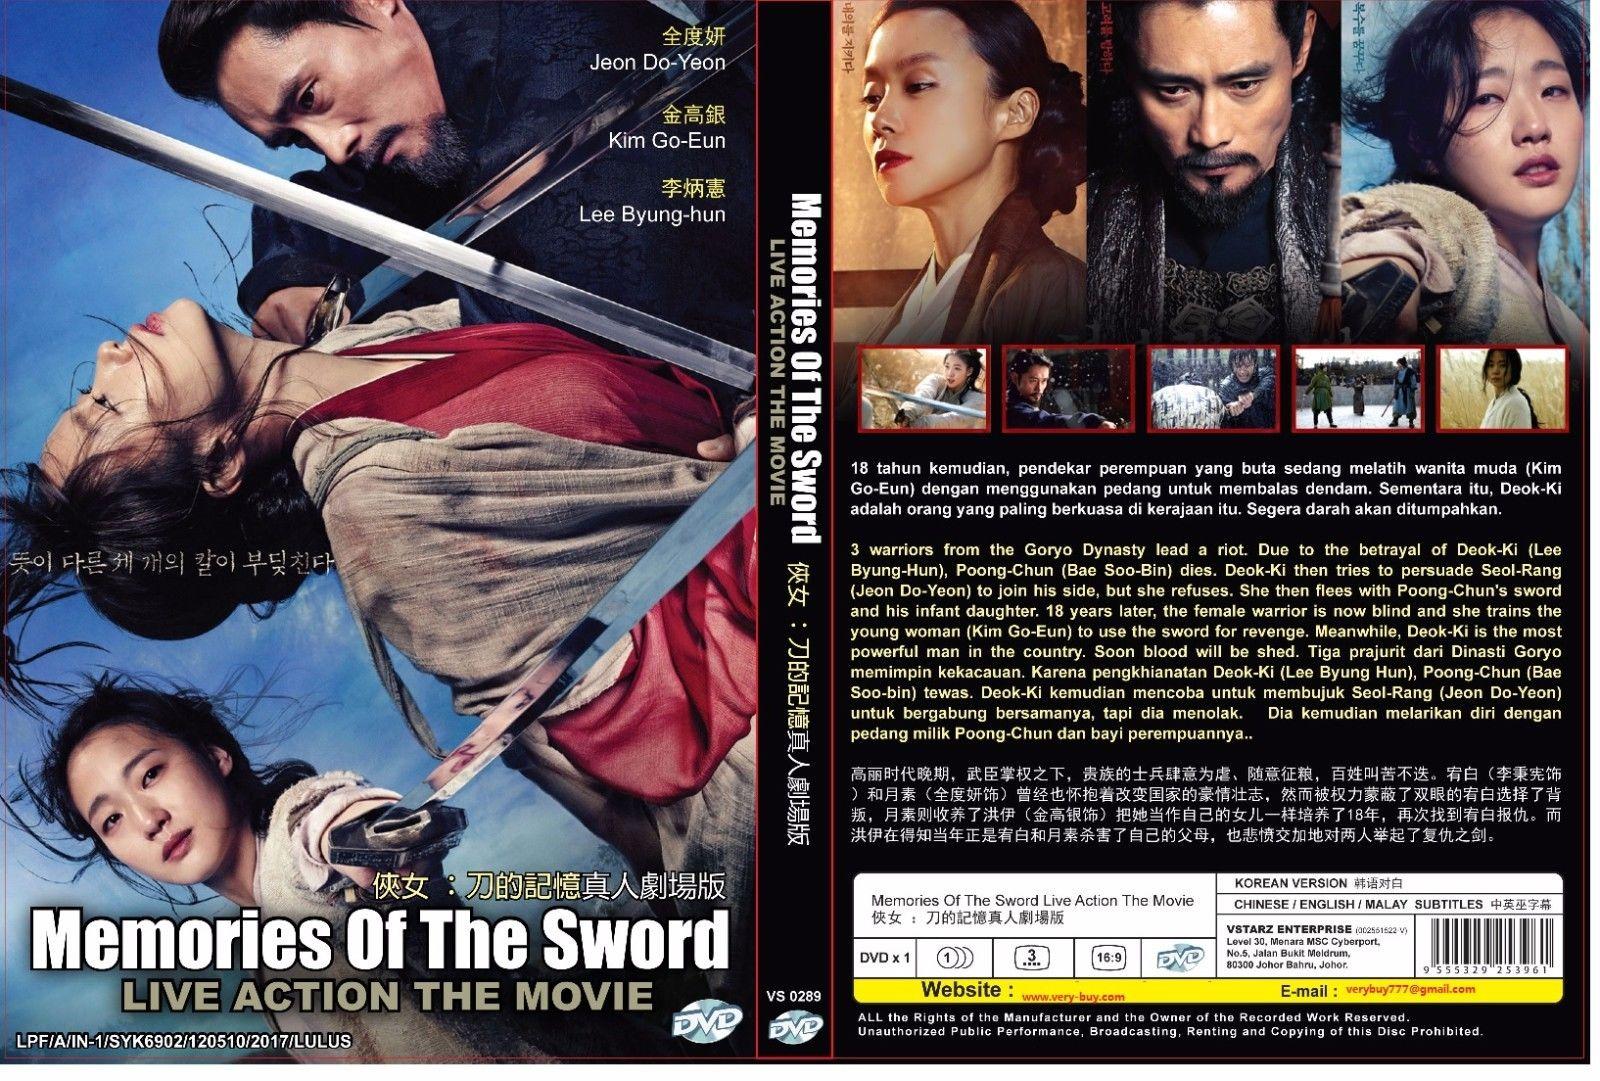 Memories Of The Sword KOREAN MOVIE